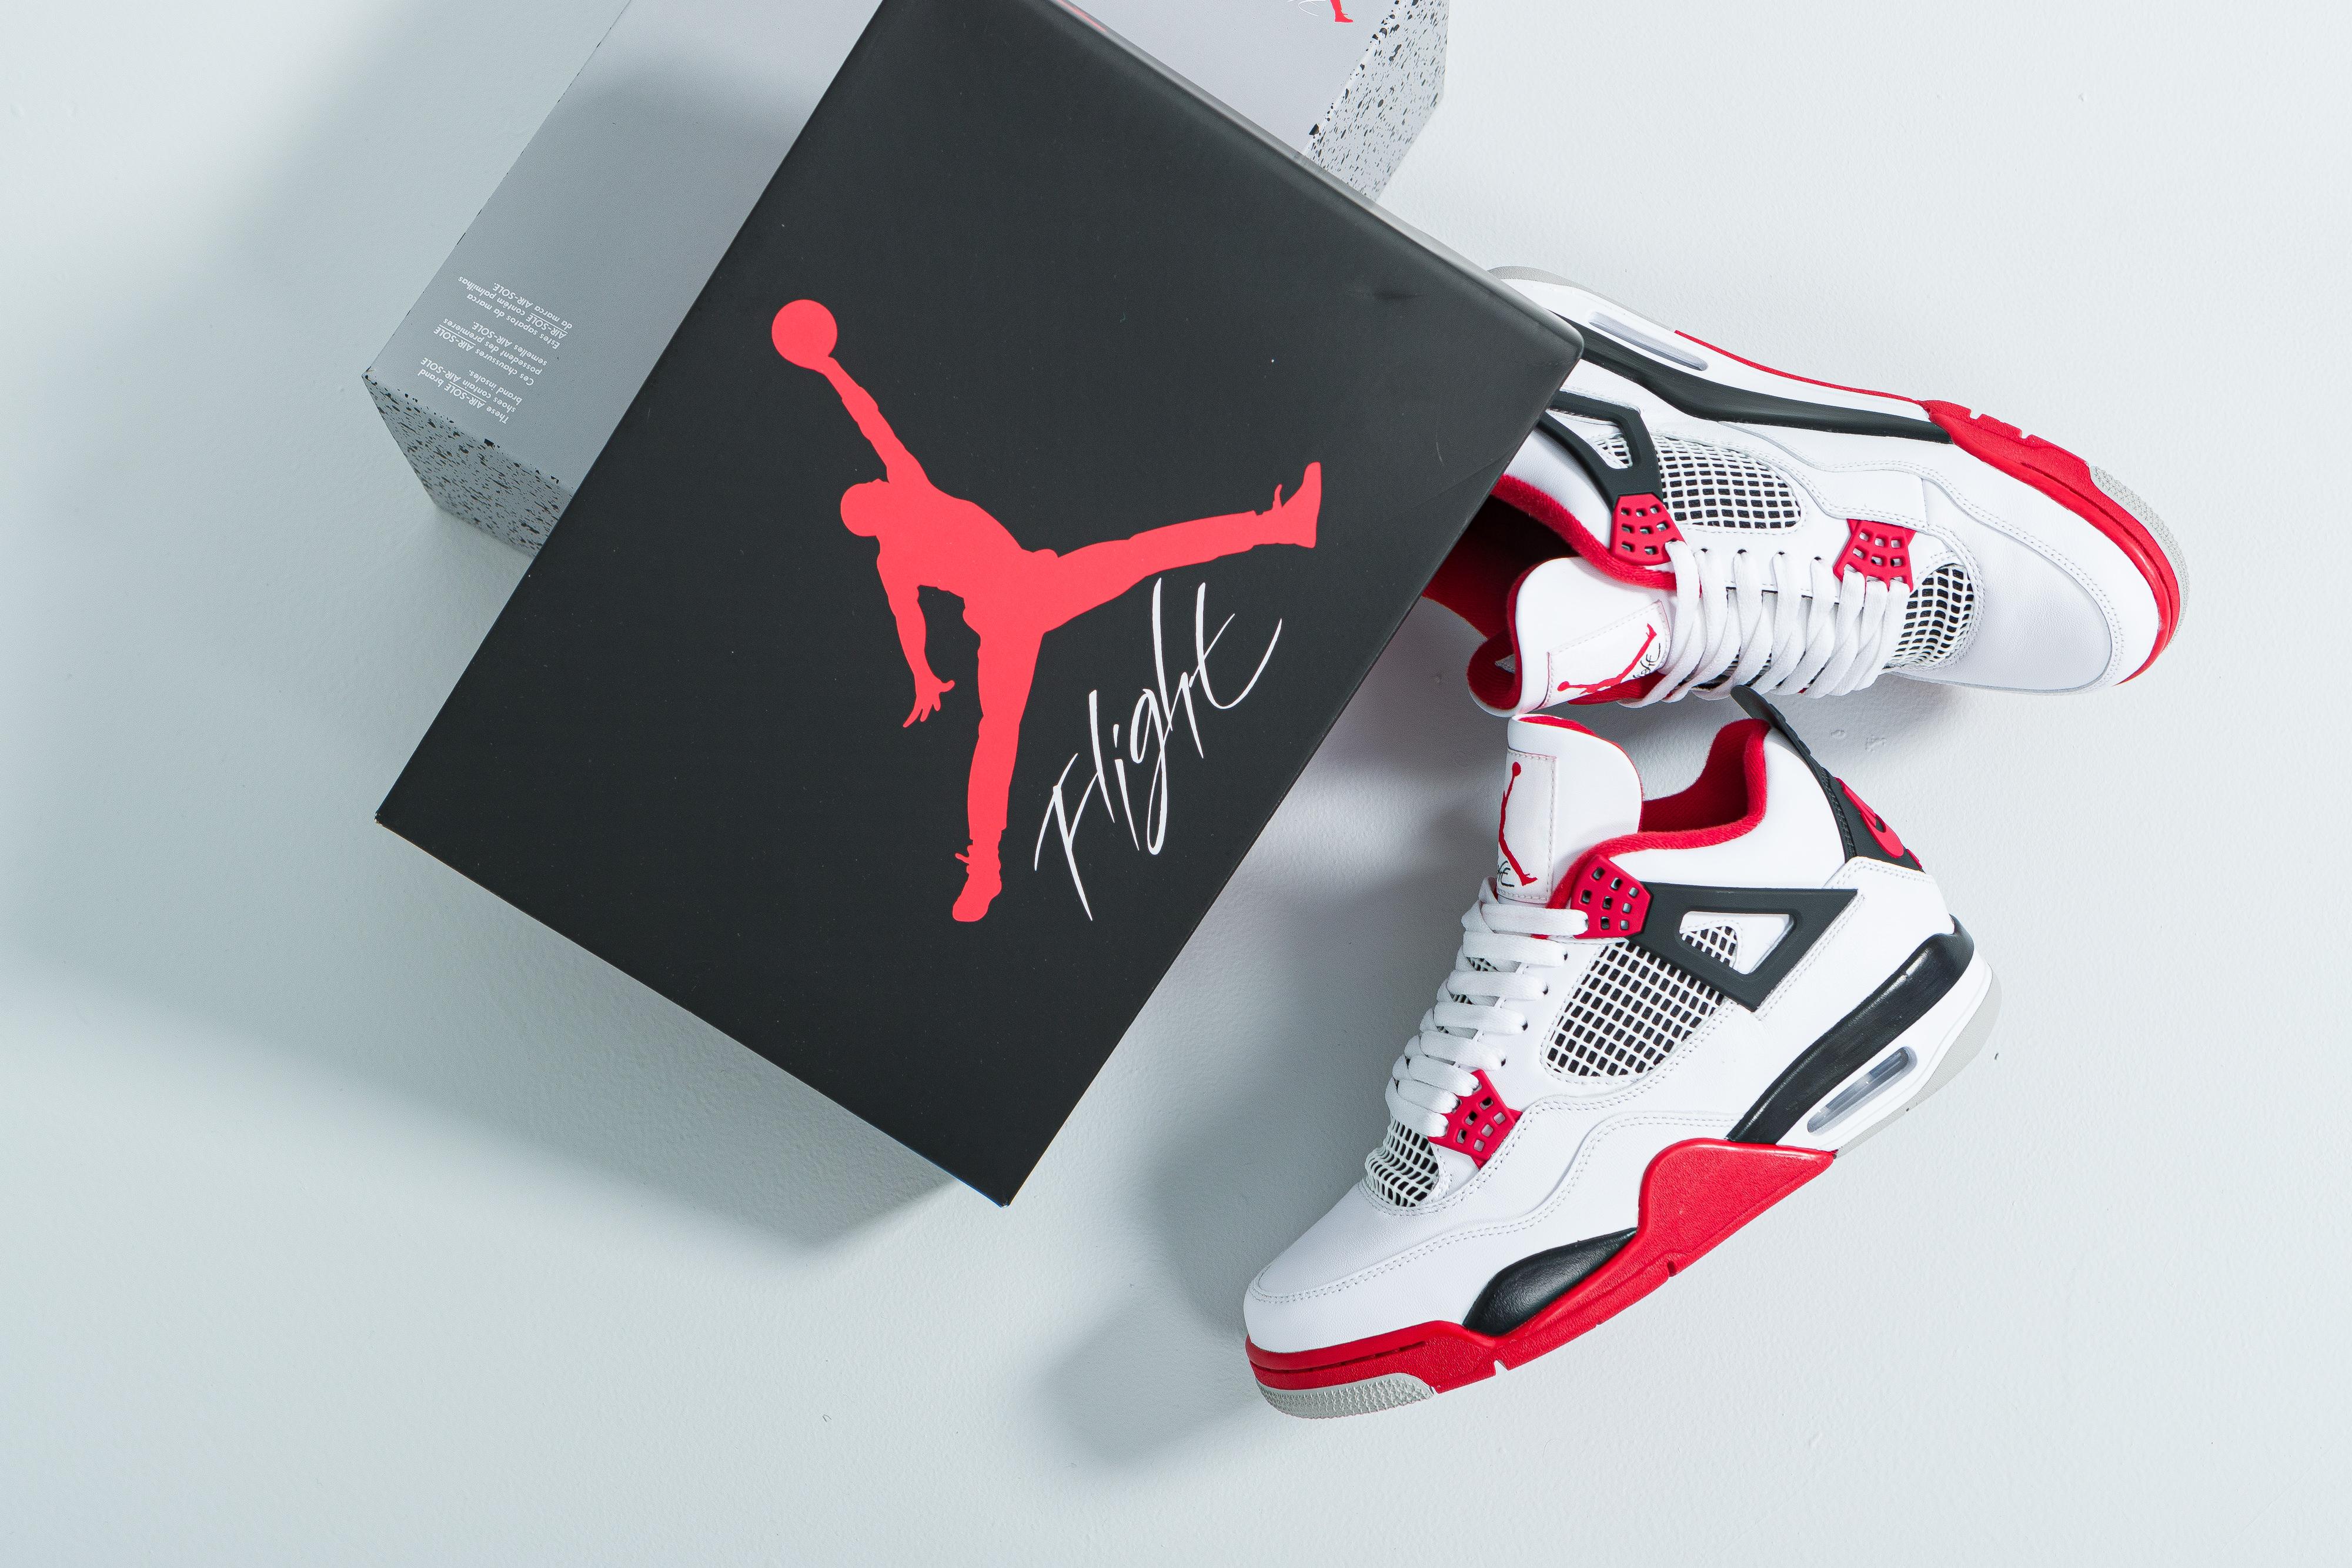 Jordan - Air Jordan 4 Retro - White/Fire Red-Black-Tech Grey - Up There